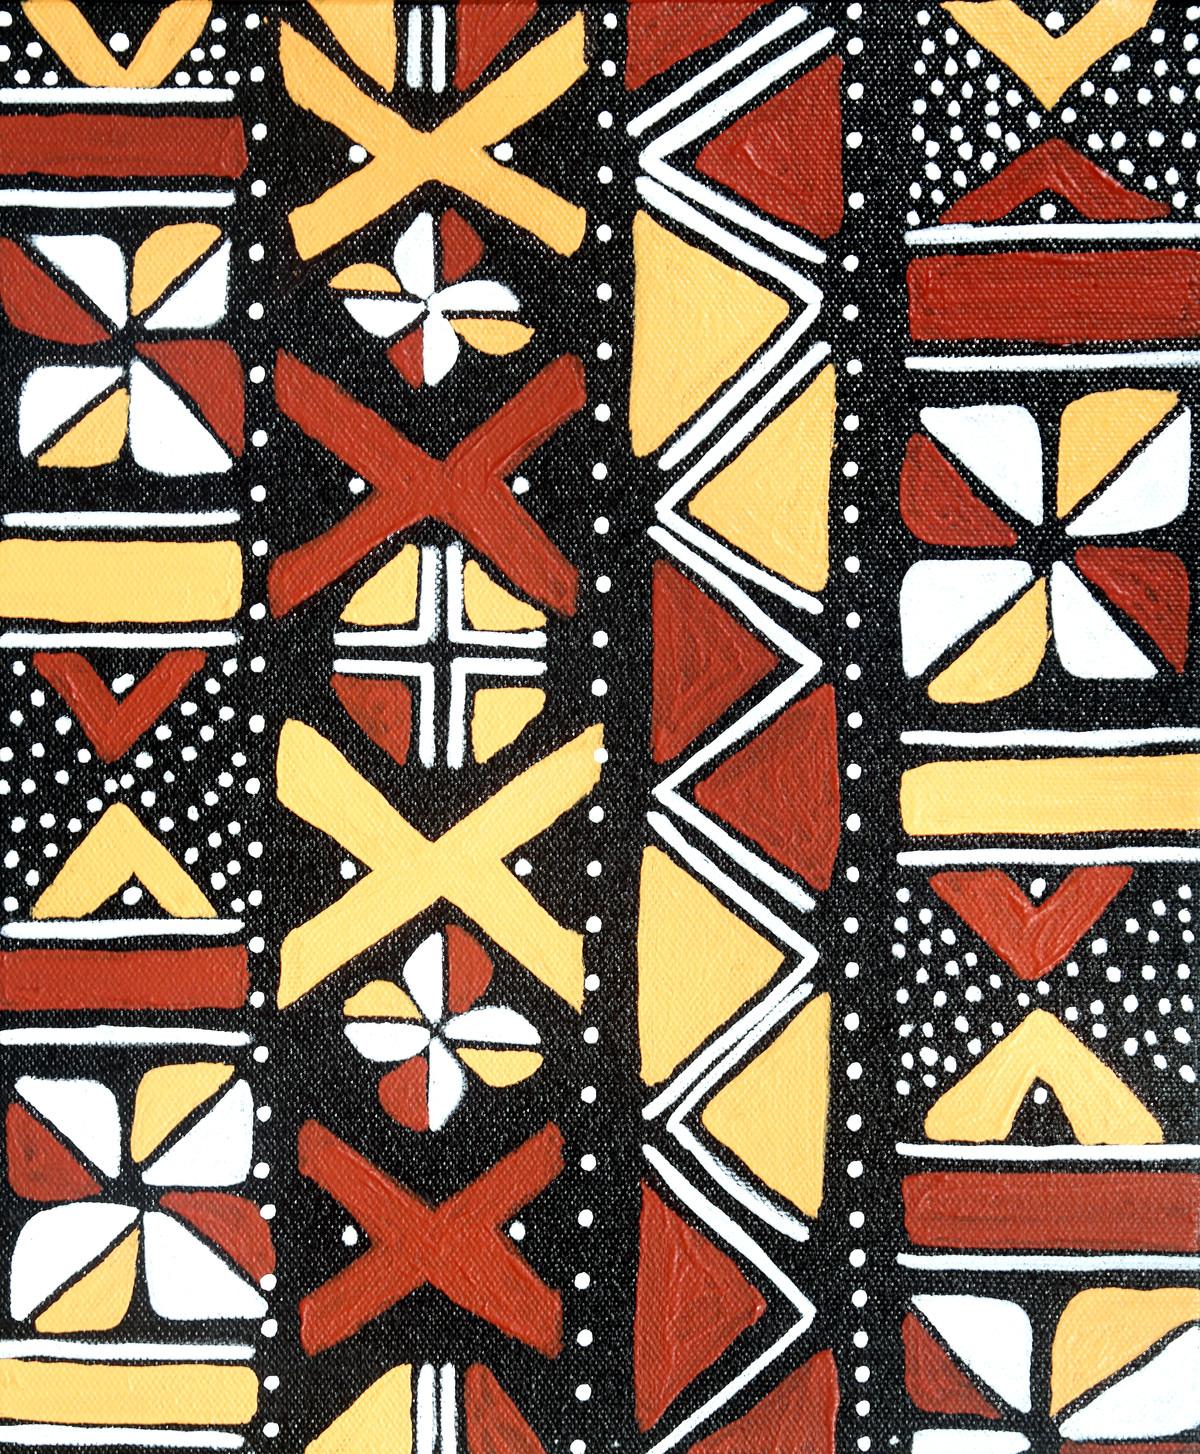 Bogolan_SD2 by Scharada Dubey, Geometrical Painting, Acrylic & Ink on Canvas,